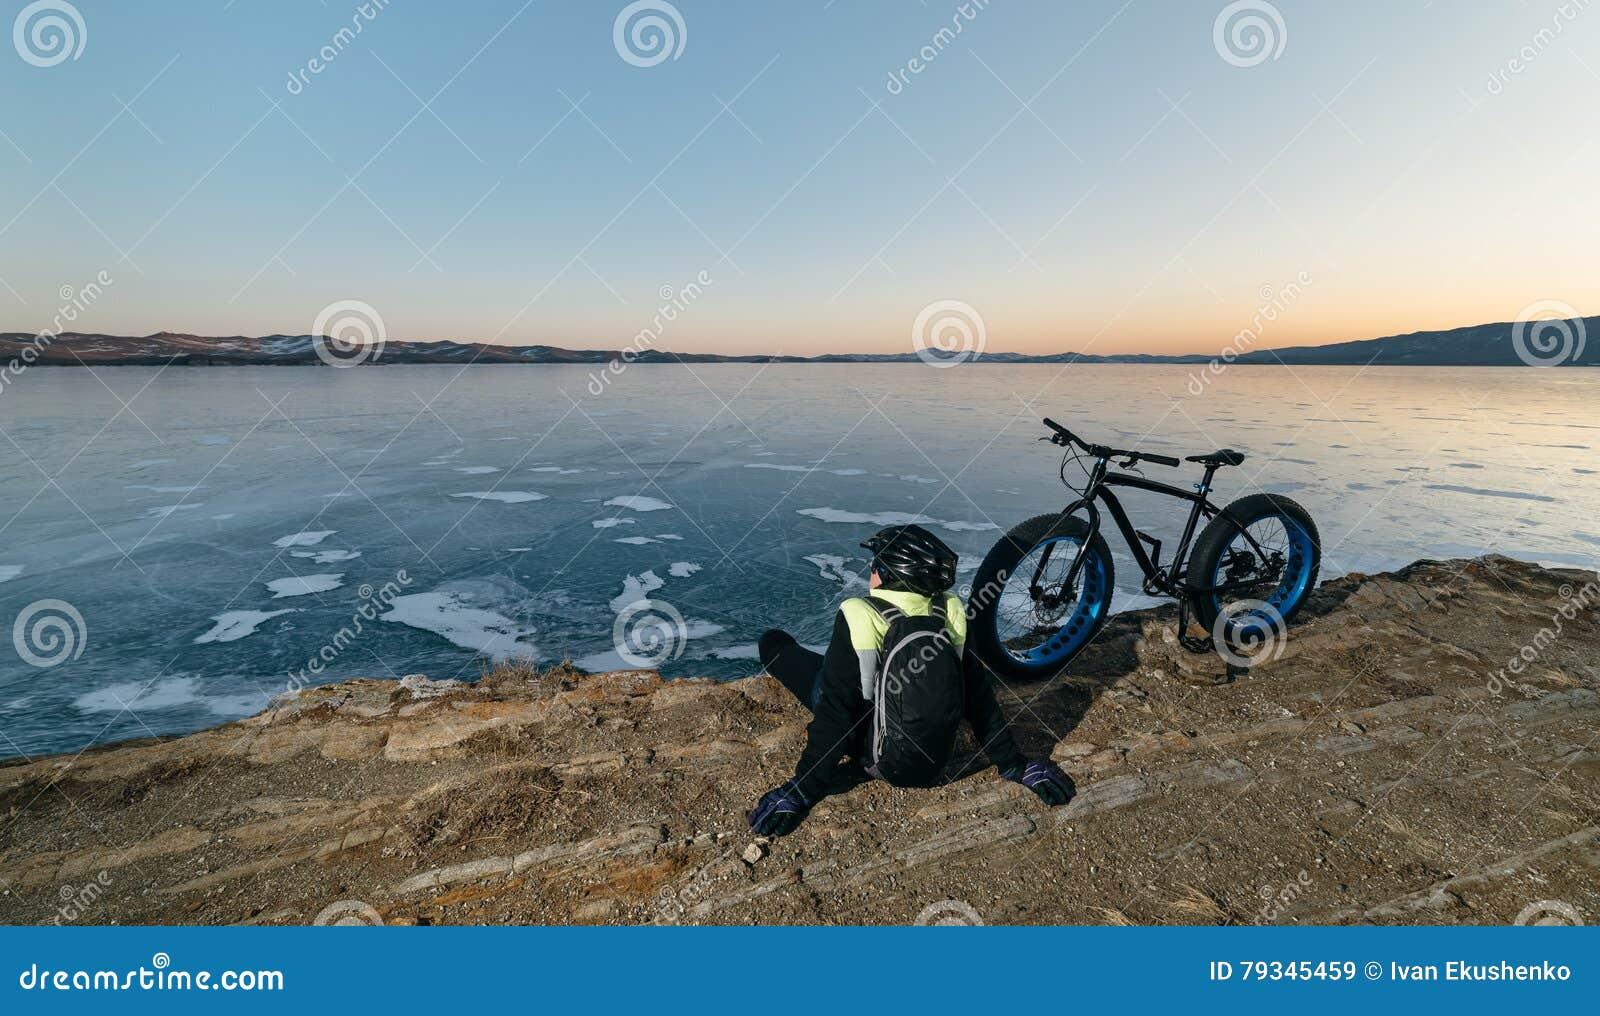 Fatbike fat bike or fat-tire bike